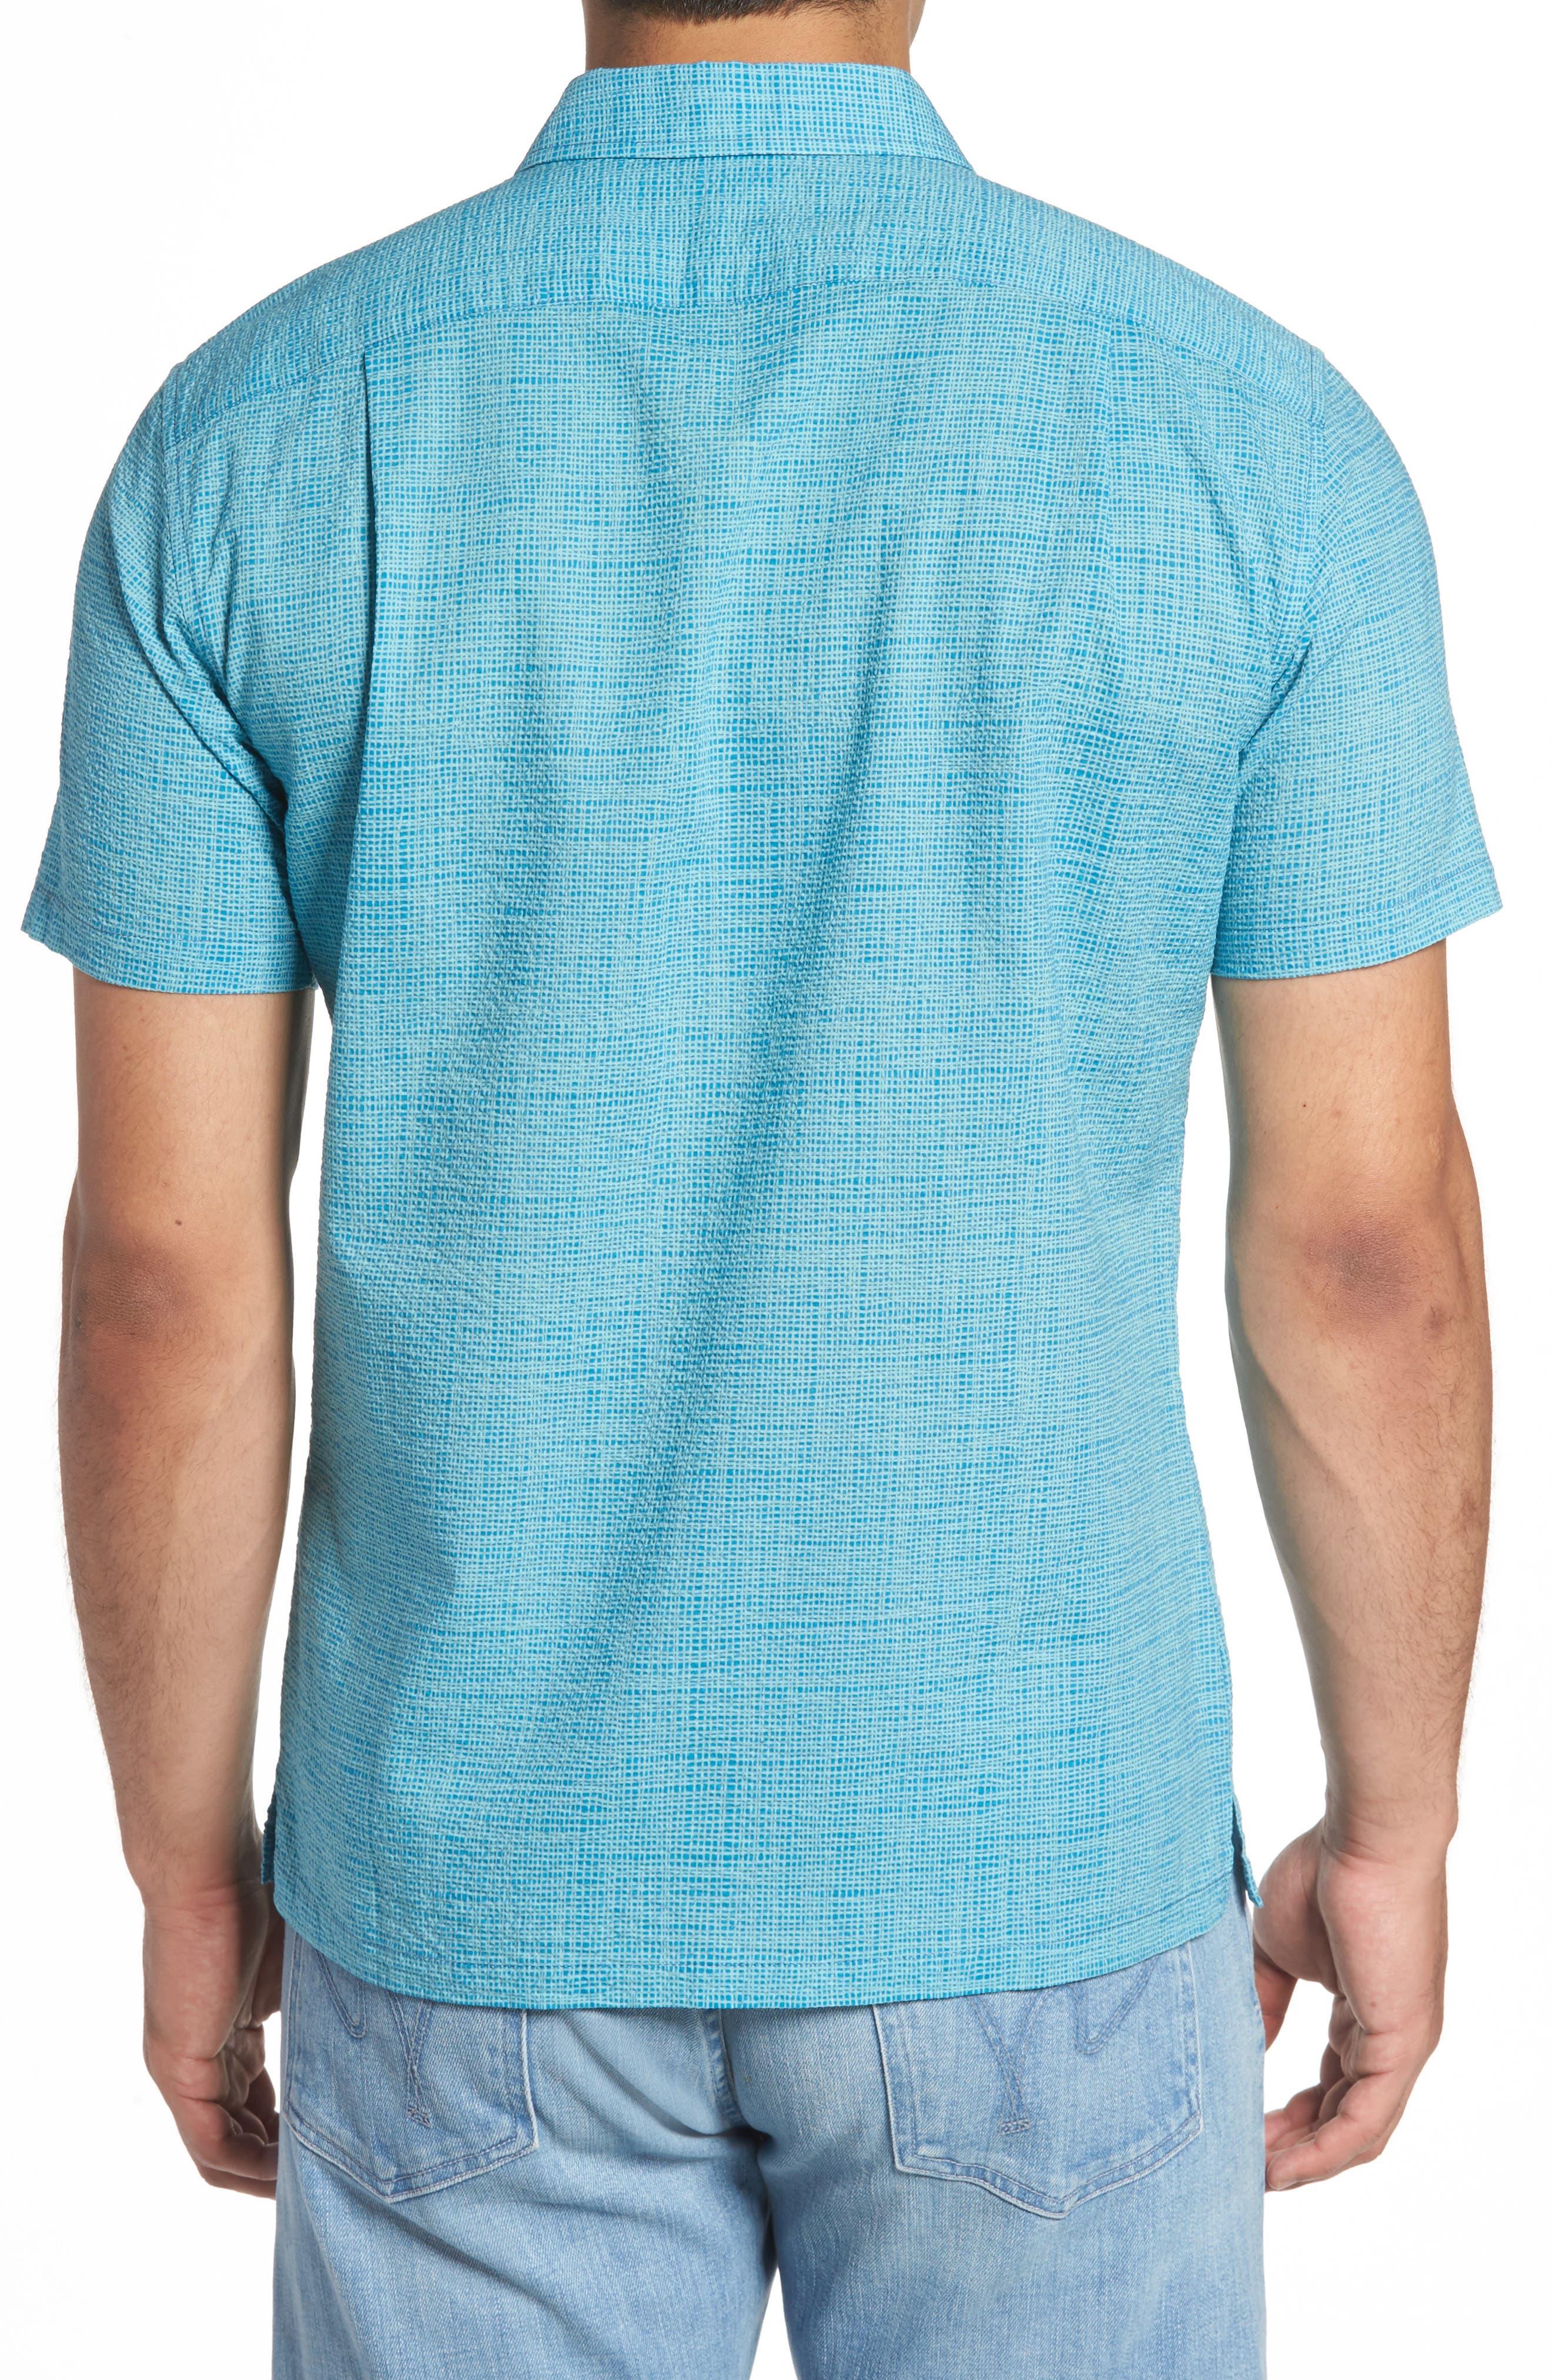 Net Worth Slim Fit Camp Shirt,                             Alternate thumbnail 2, color,                             400